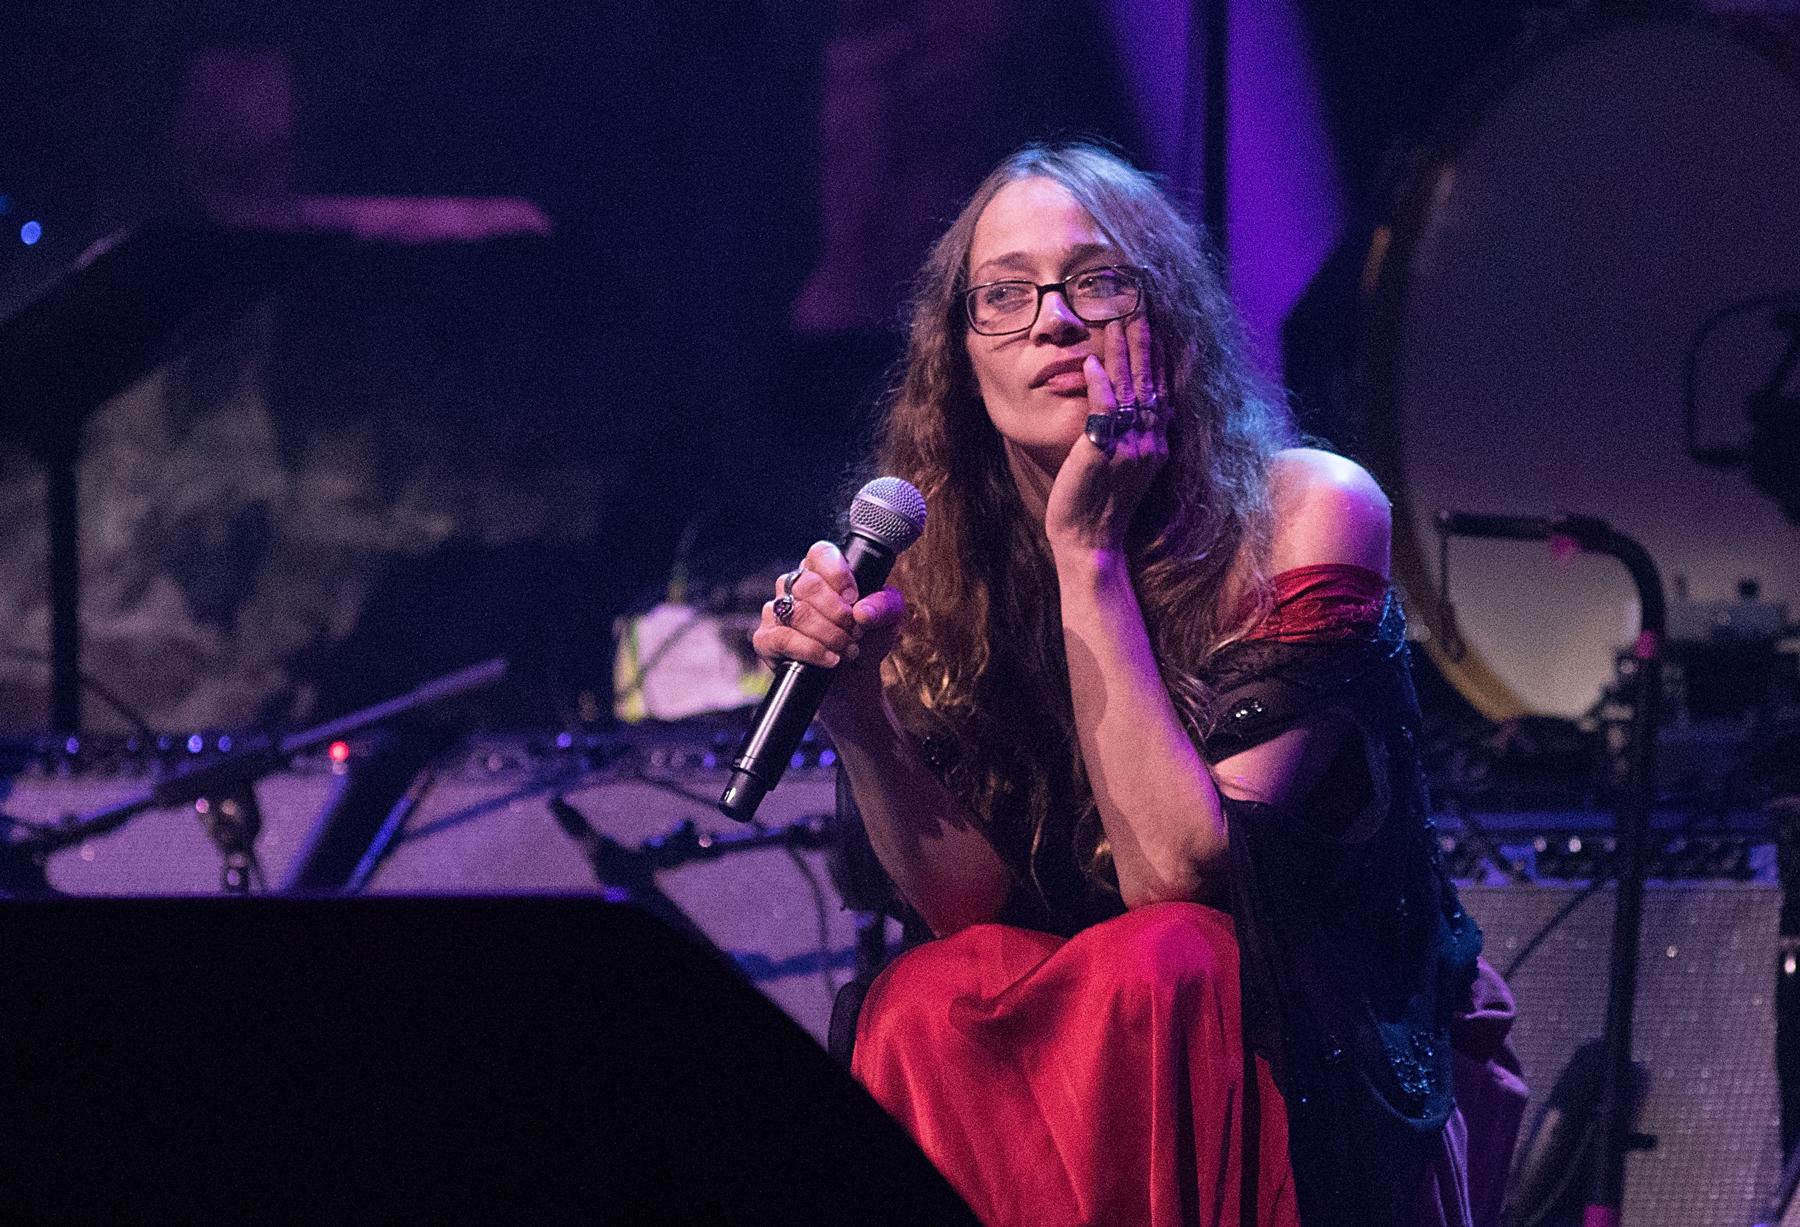 Fiona Apple Talks Grammys Hypocrisy, Says She Considered Boycott Over Dr. Luke Nomination